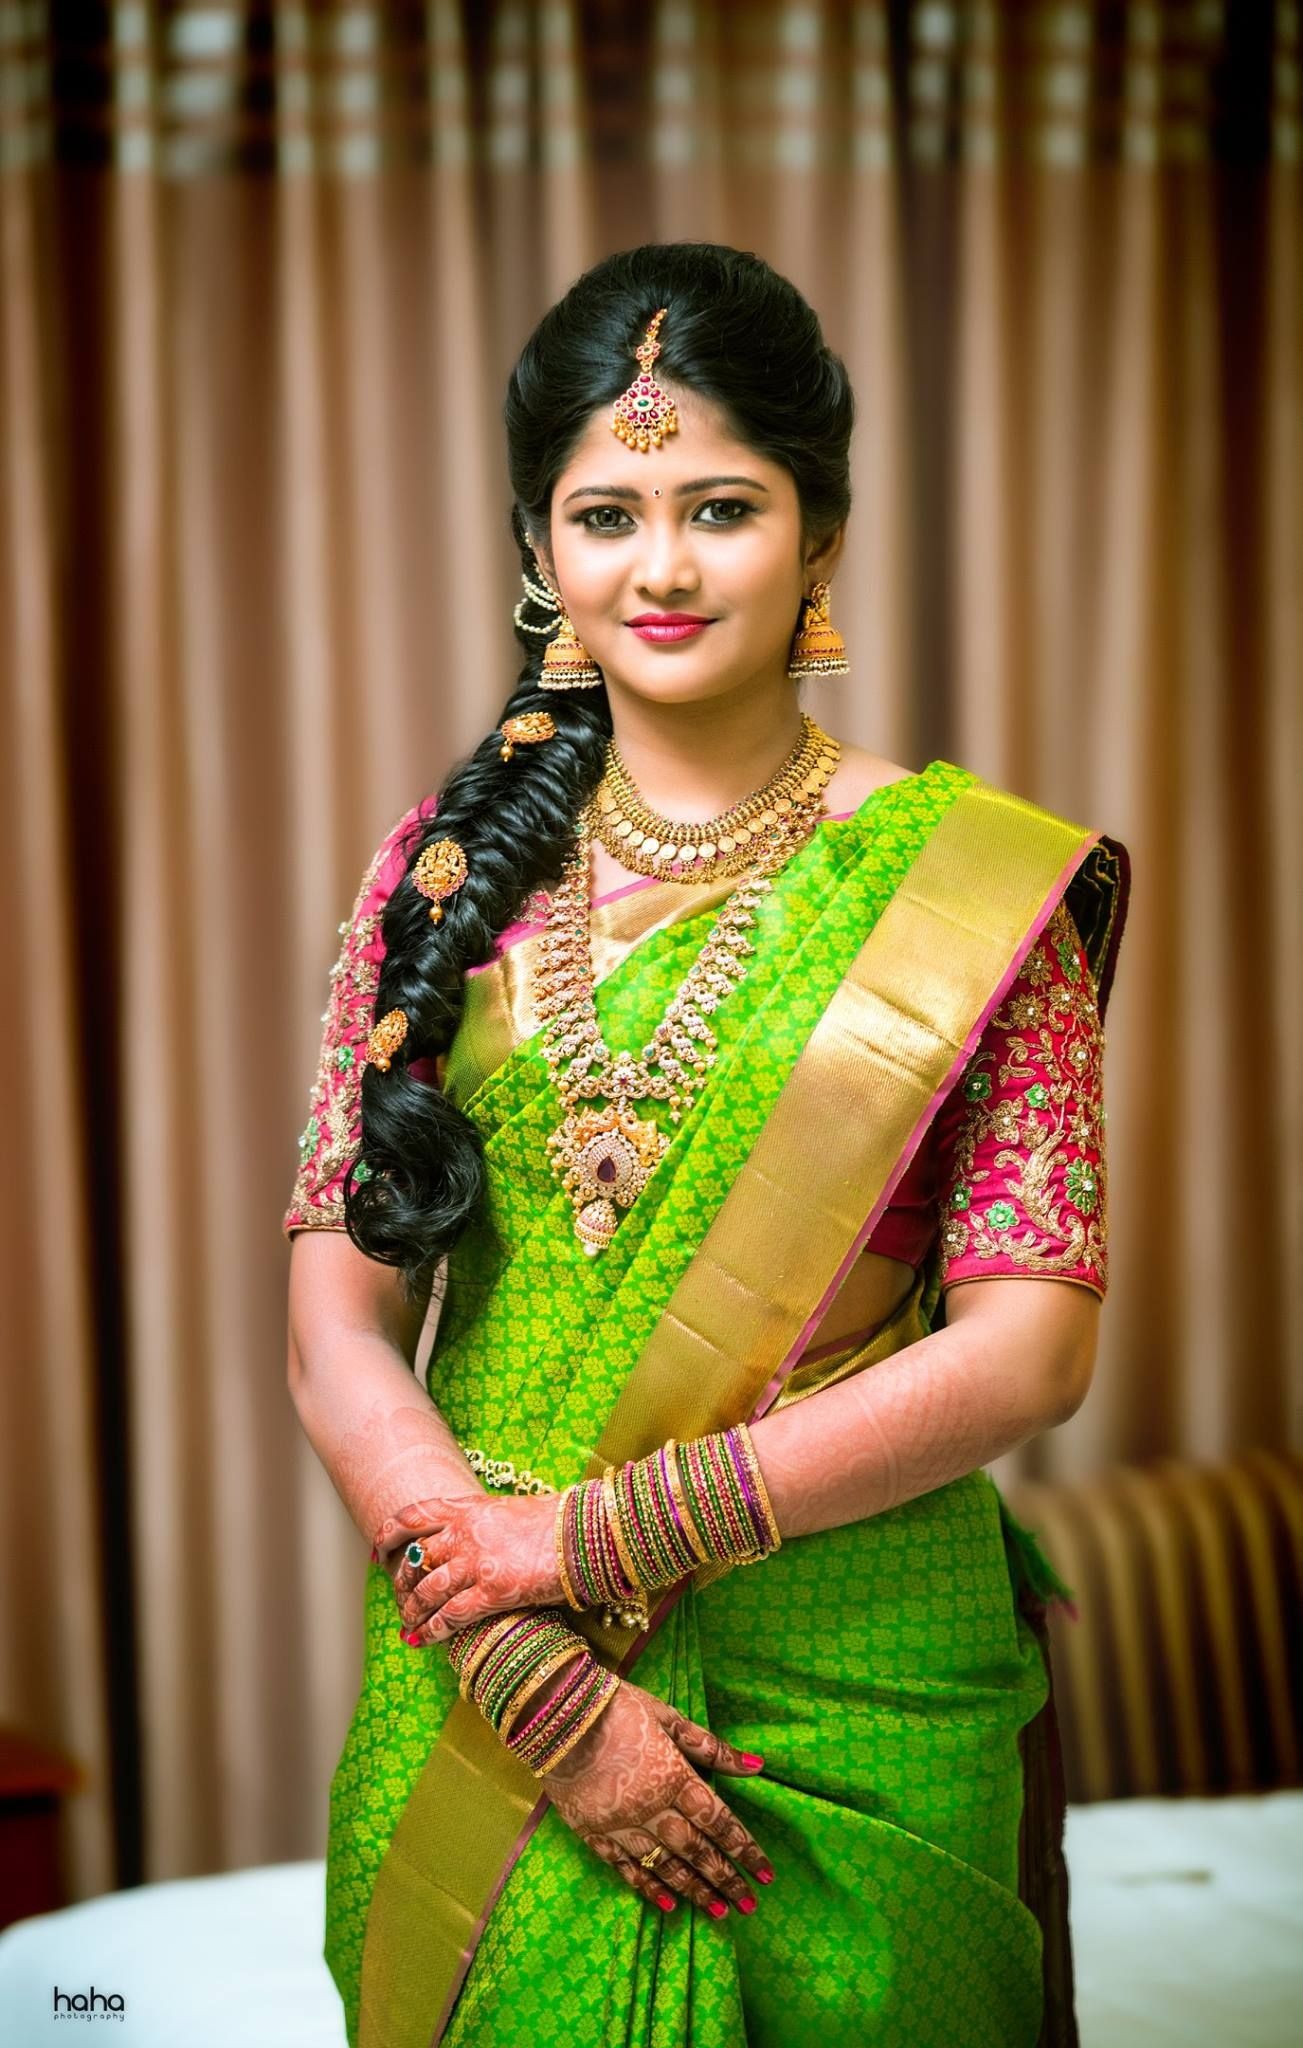 wedding photographers in chennai, best wedding photography